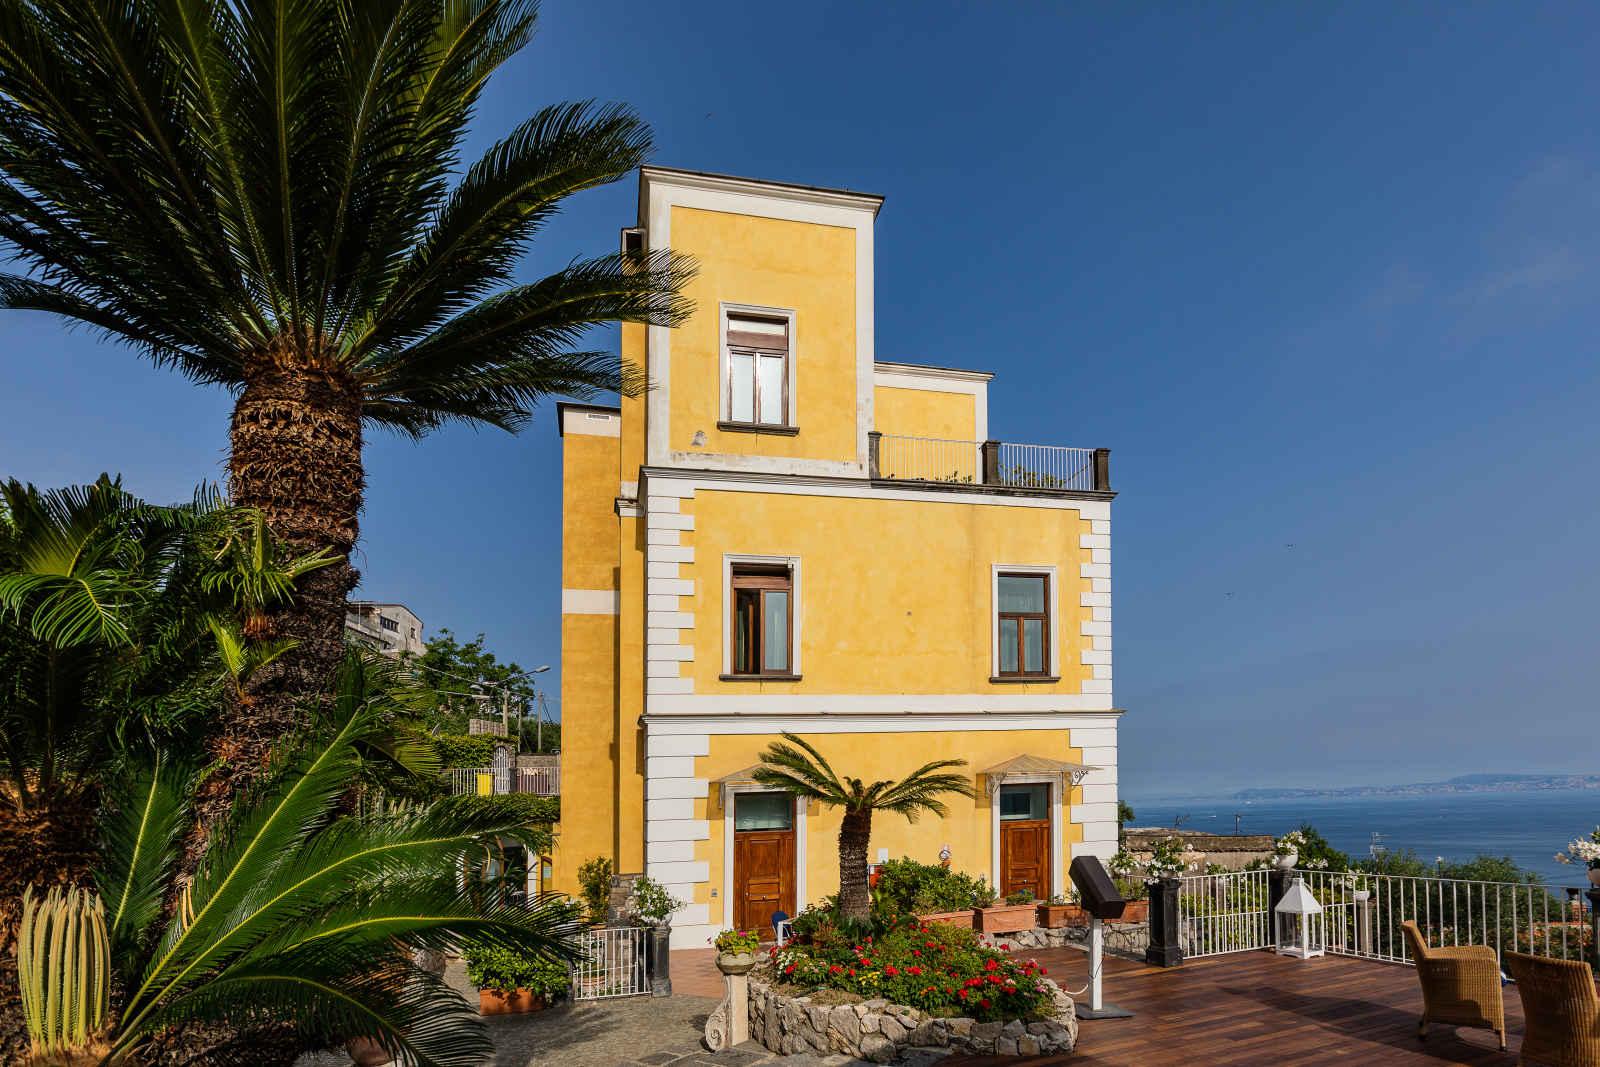 Séjour Côte Amalfitaine - Torre Barbara Hotel & Restaurant - 4*